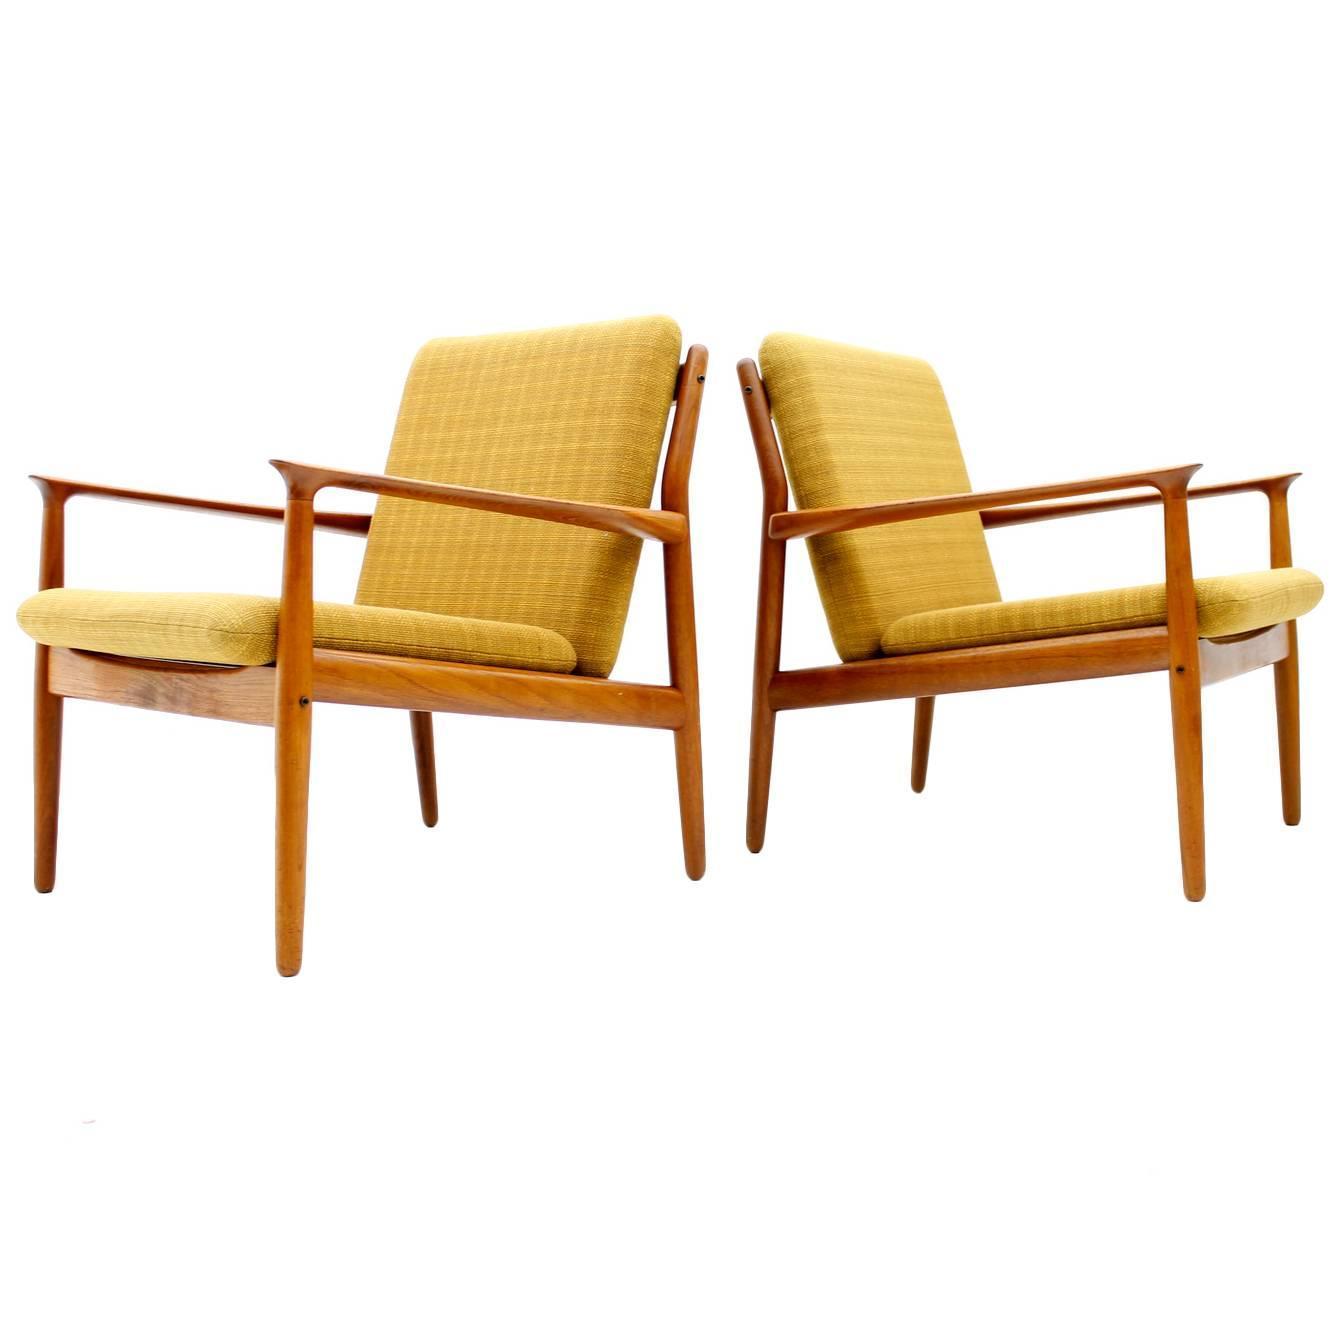 Pair Danish Teak Lounge Chairs by Grete Jalk 1960 at 1stdibs